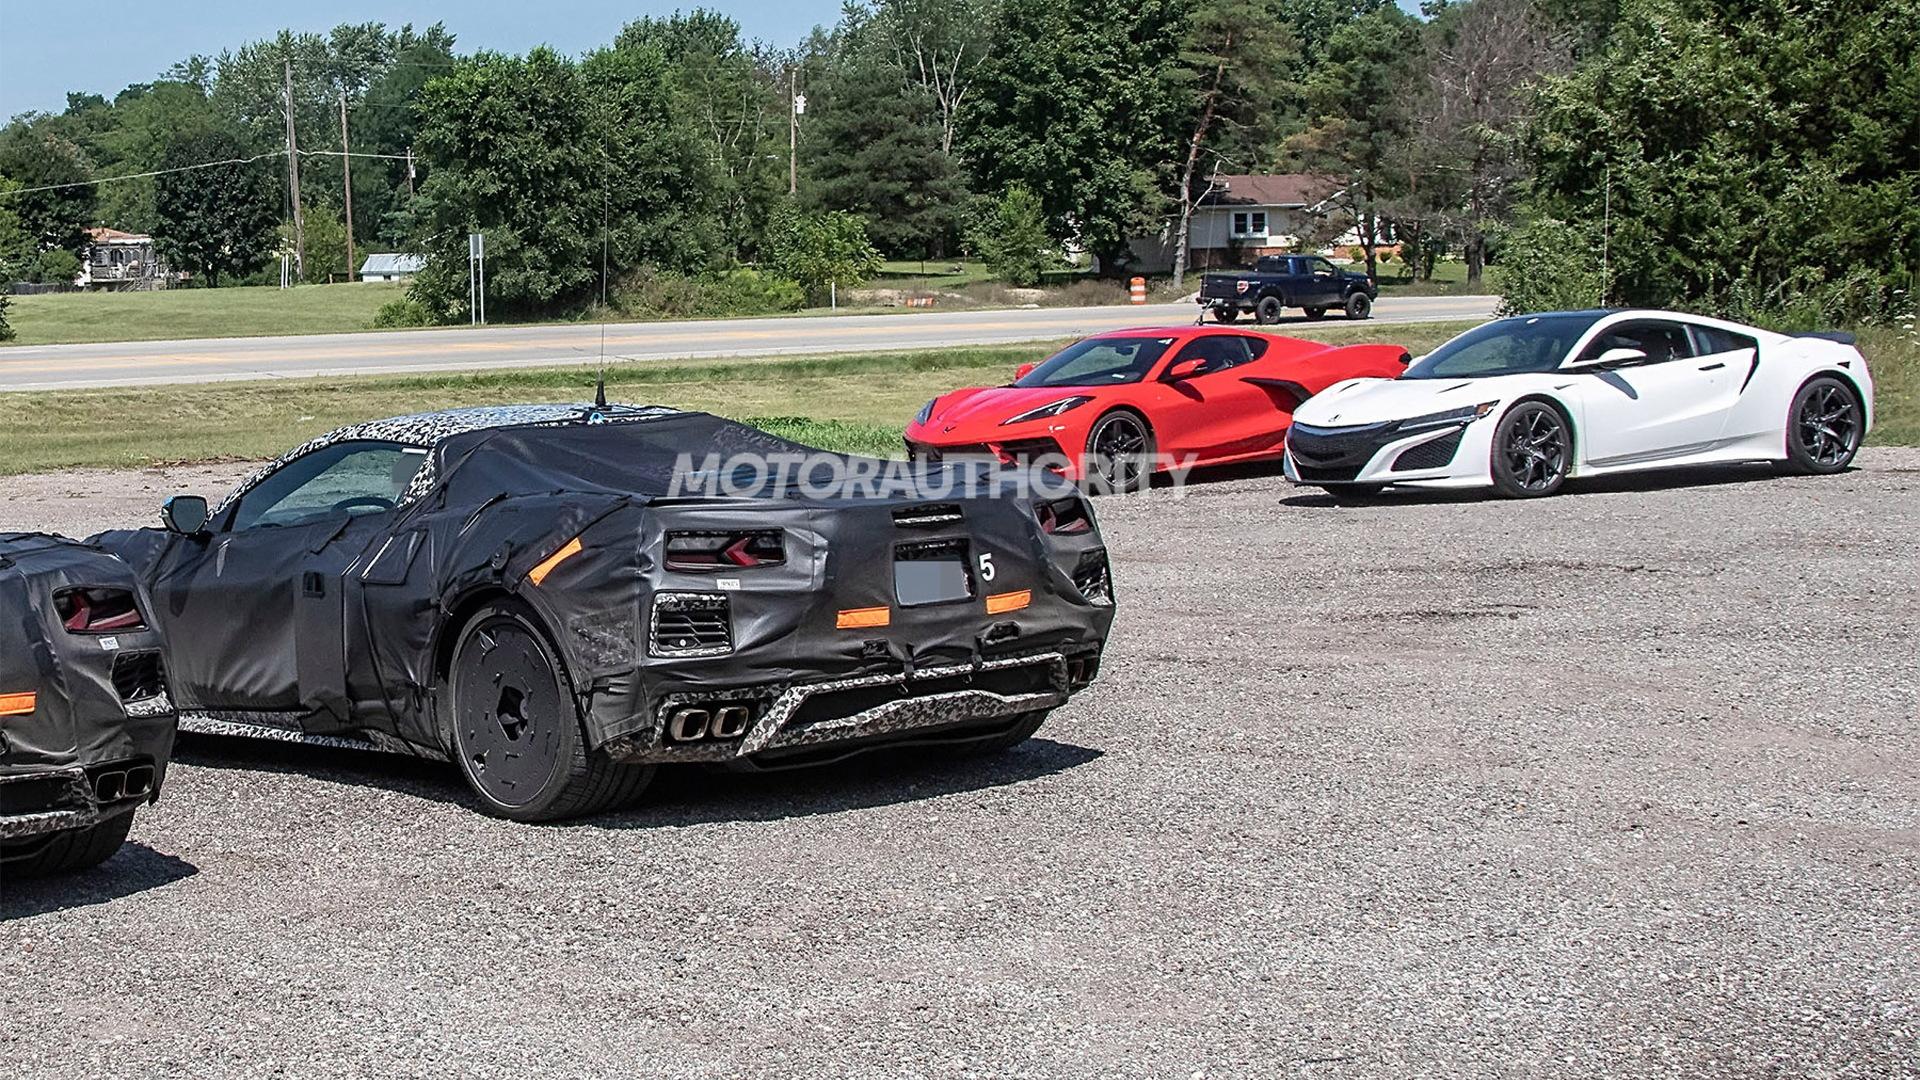 2023 Chevrolet Corvette E-Ray spy shots - Photo credit:S. Baldauf/SB-Medien